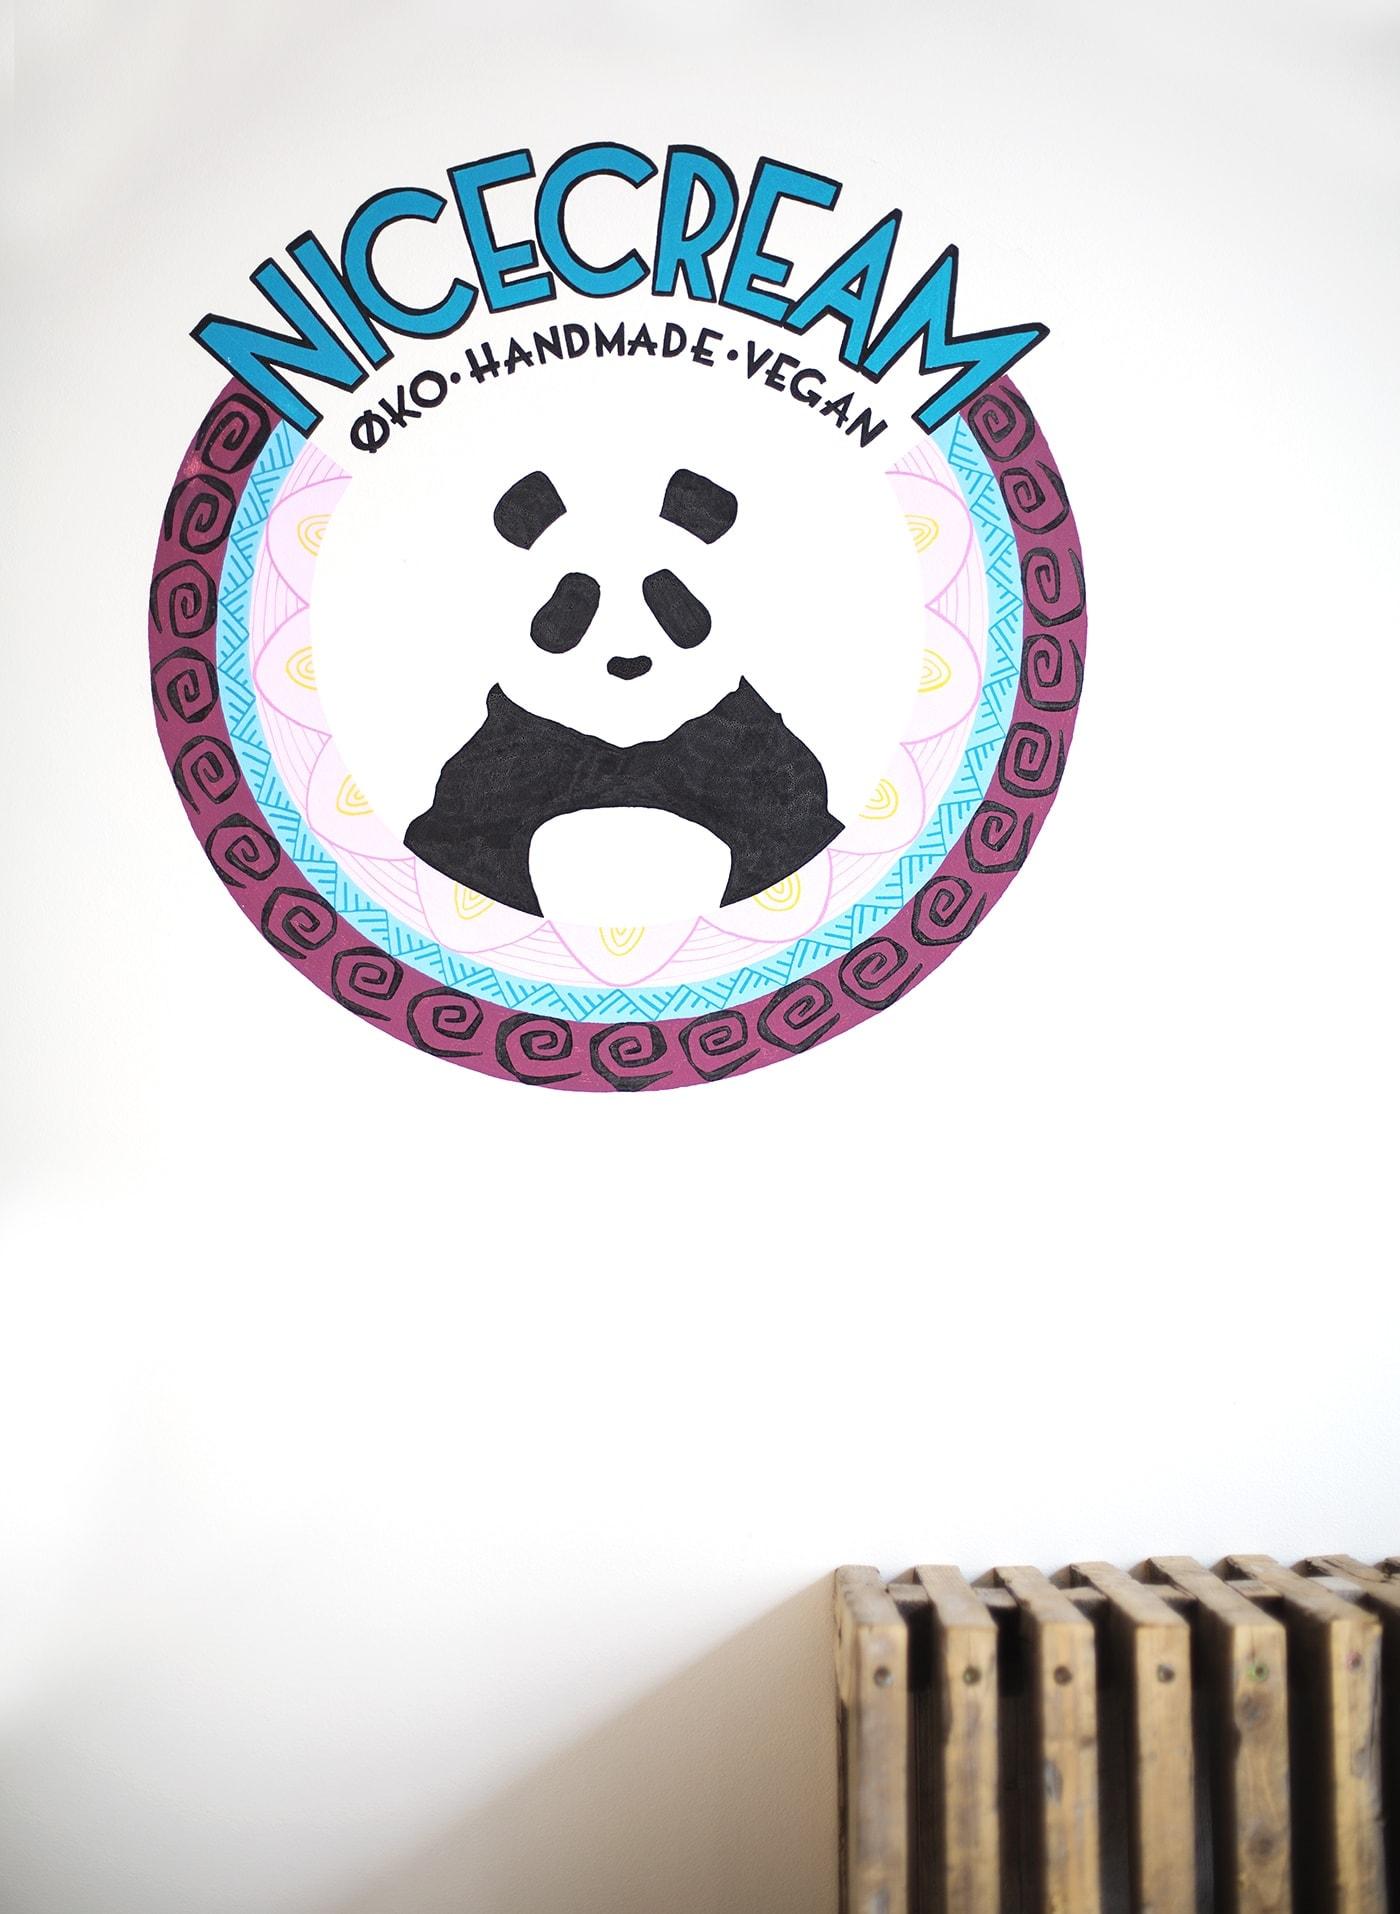 copenhagen-wanderlust-nicecream-vegan-ice-cream-shop